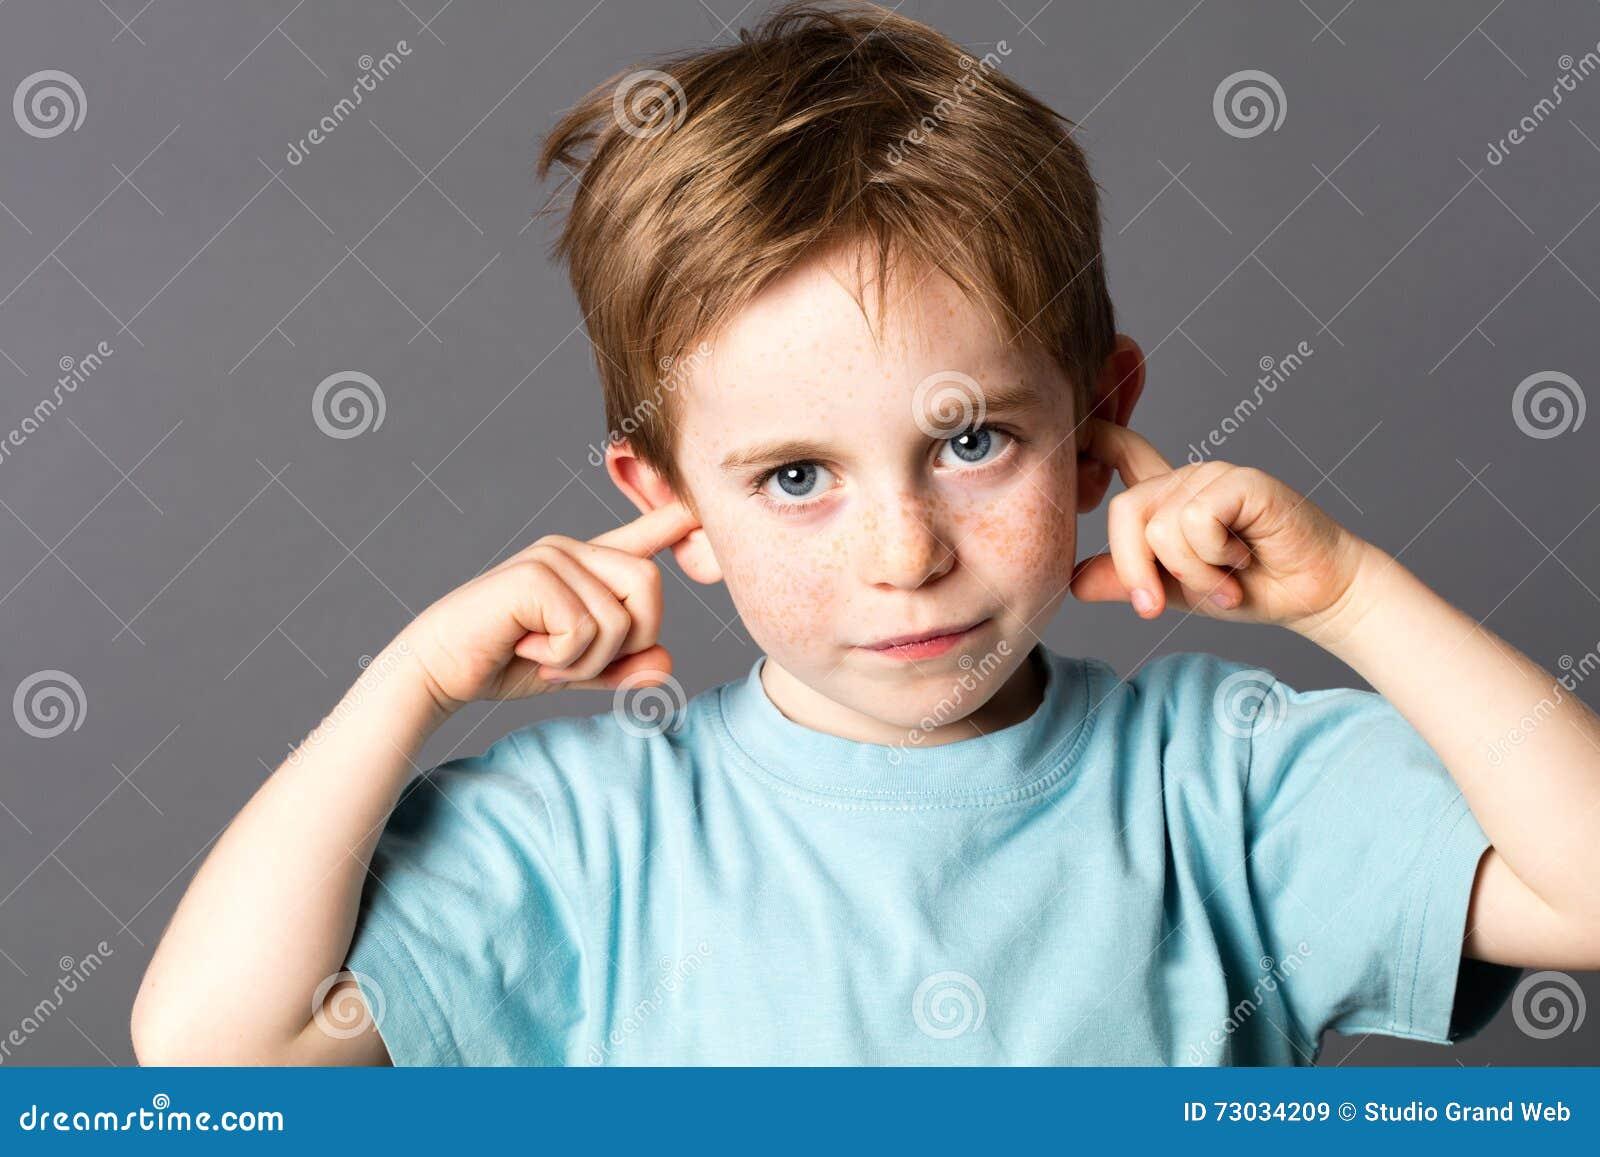 Ni o peque o triste que no quiere escuchar la violencia en - Foto nino pequeno ...